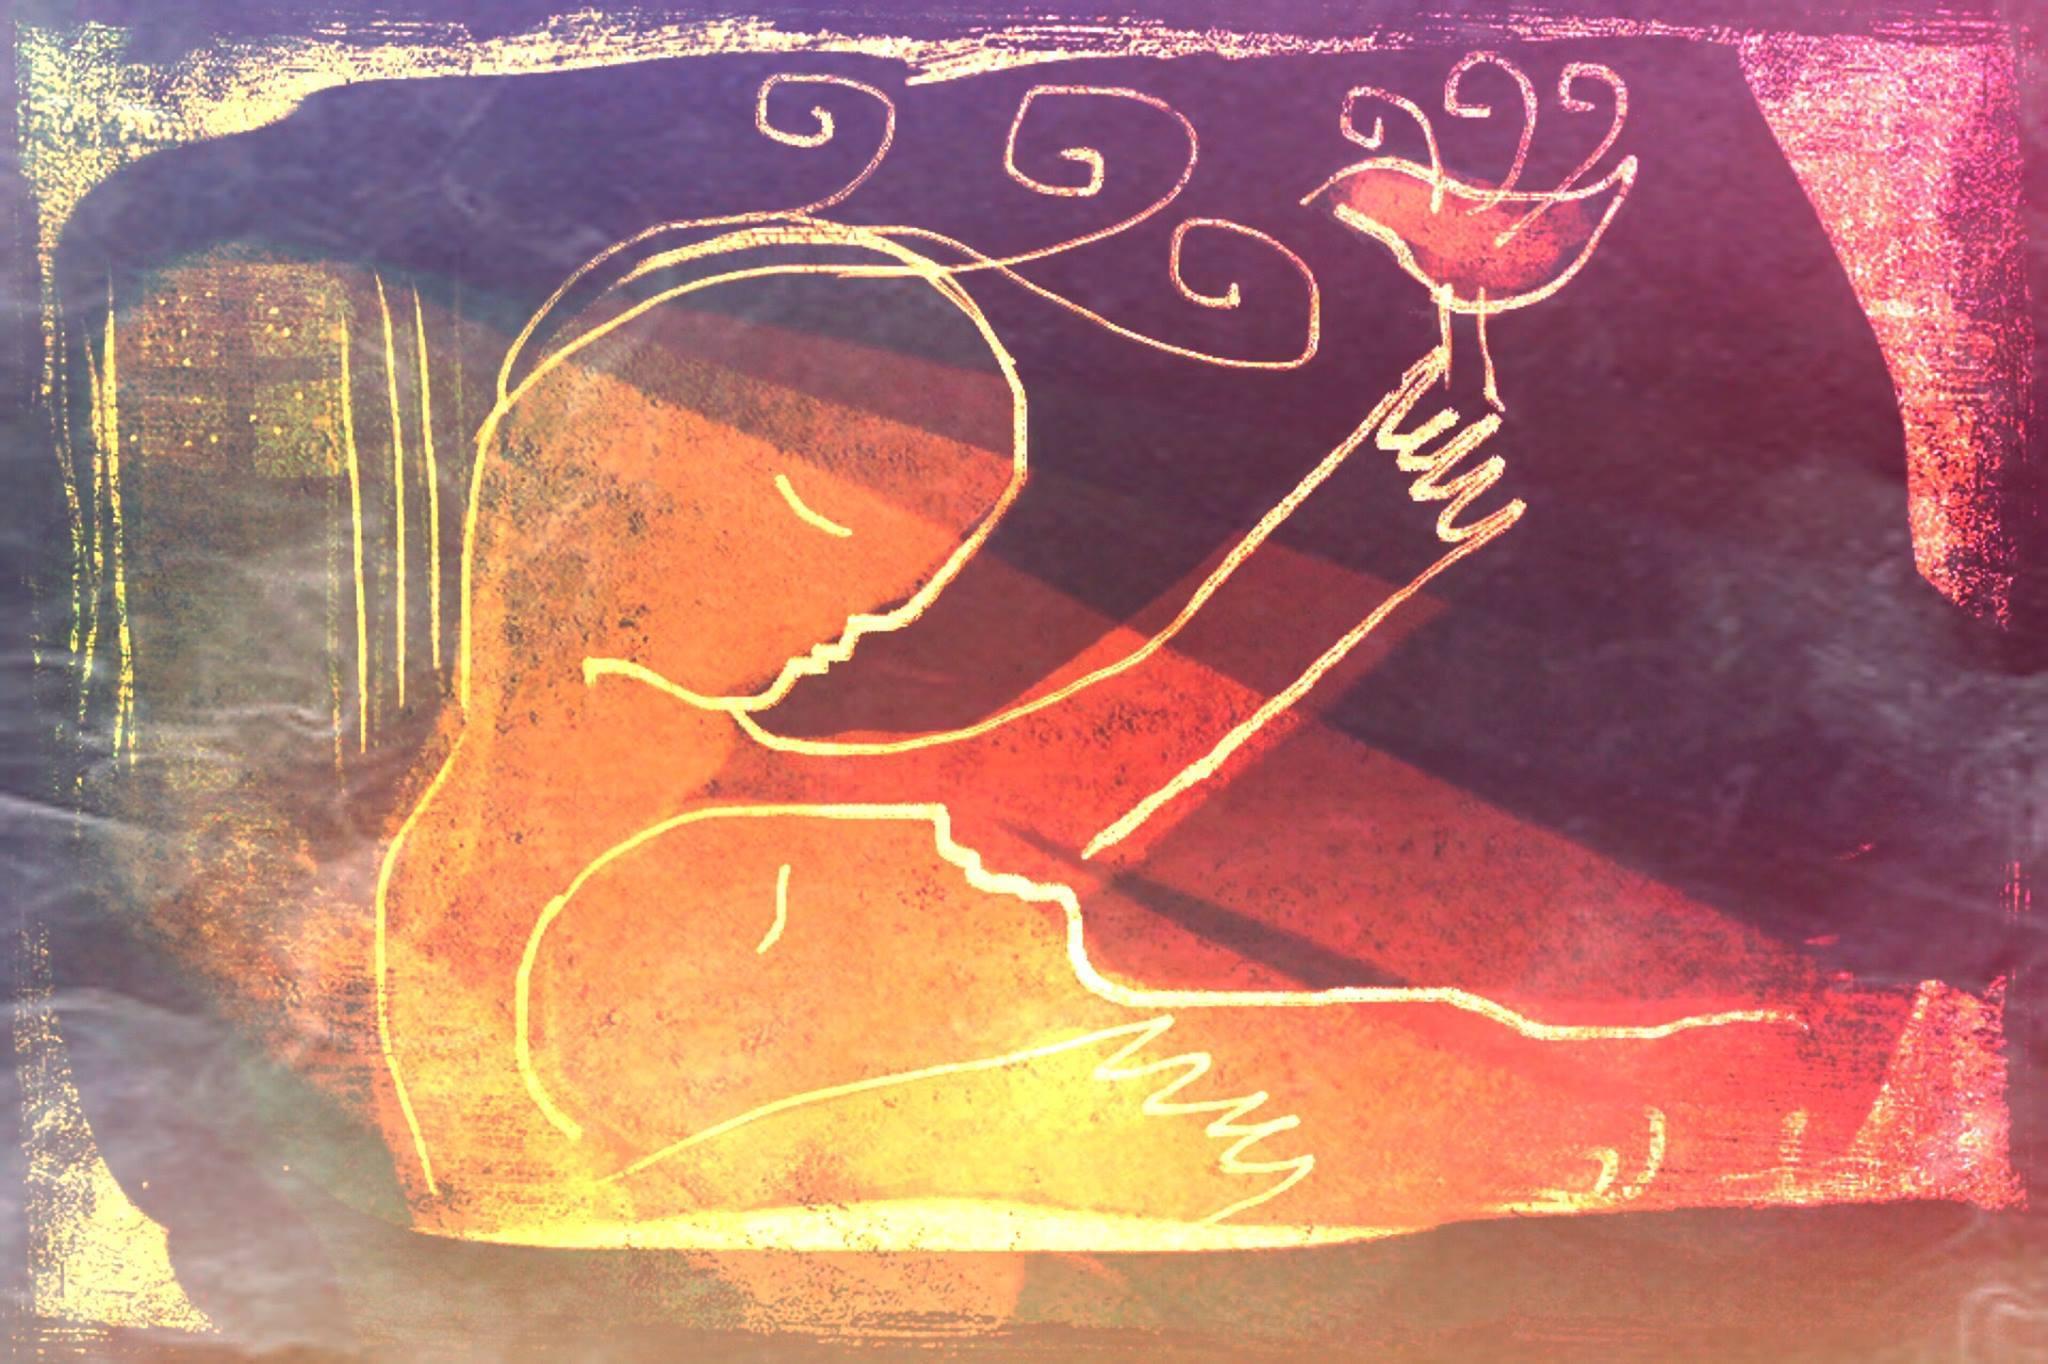 Rest in peace my love, illustration Malin Skinnar